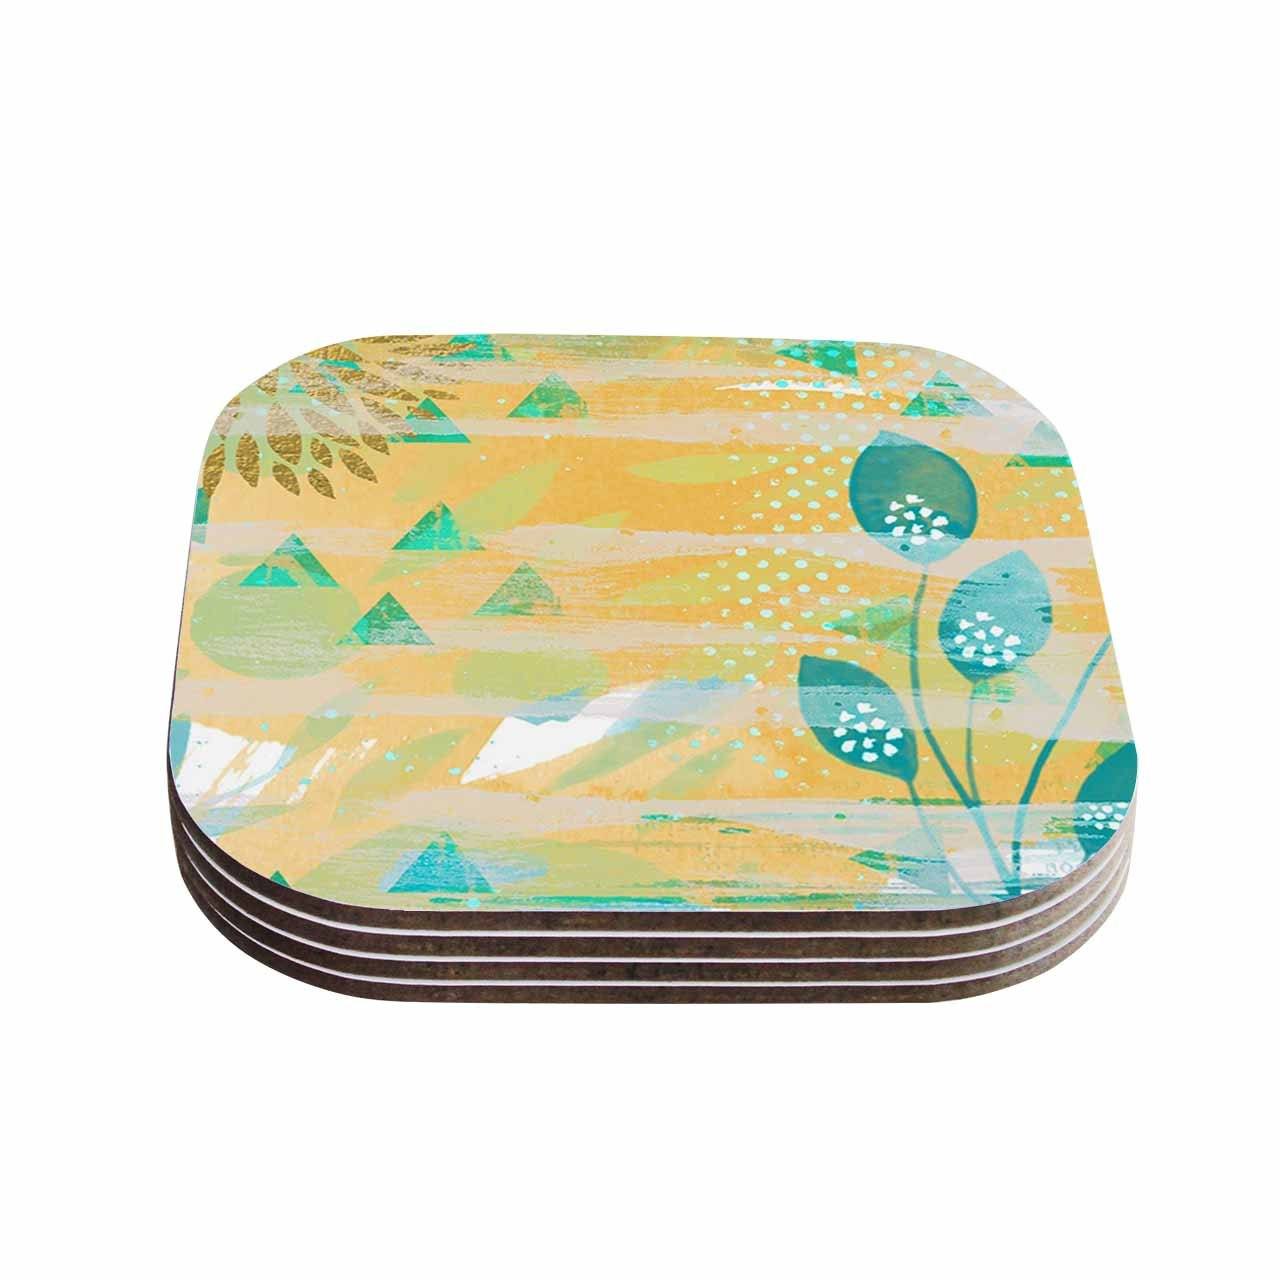 Multicolor KESS InHouse Li ZamperiniFoliage Yellow Green Coasters 4 x 4 Set of 4